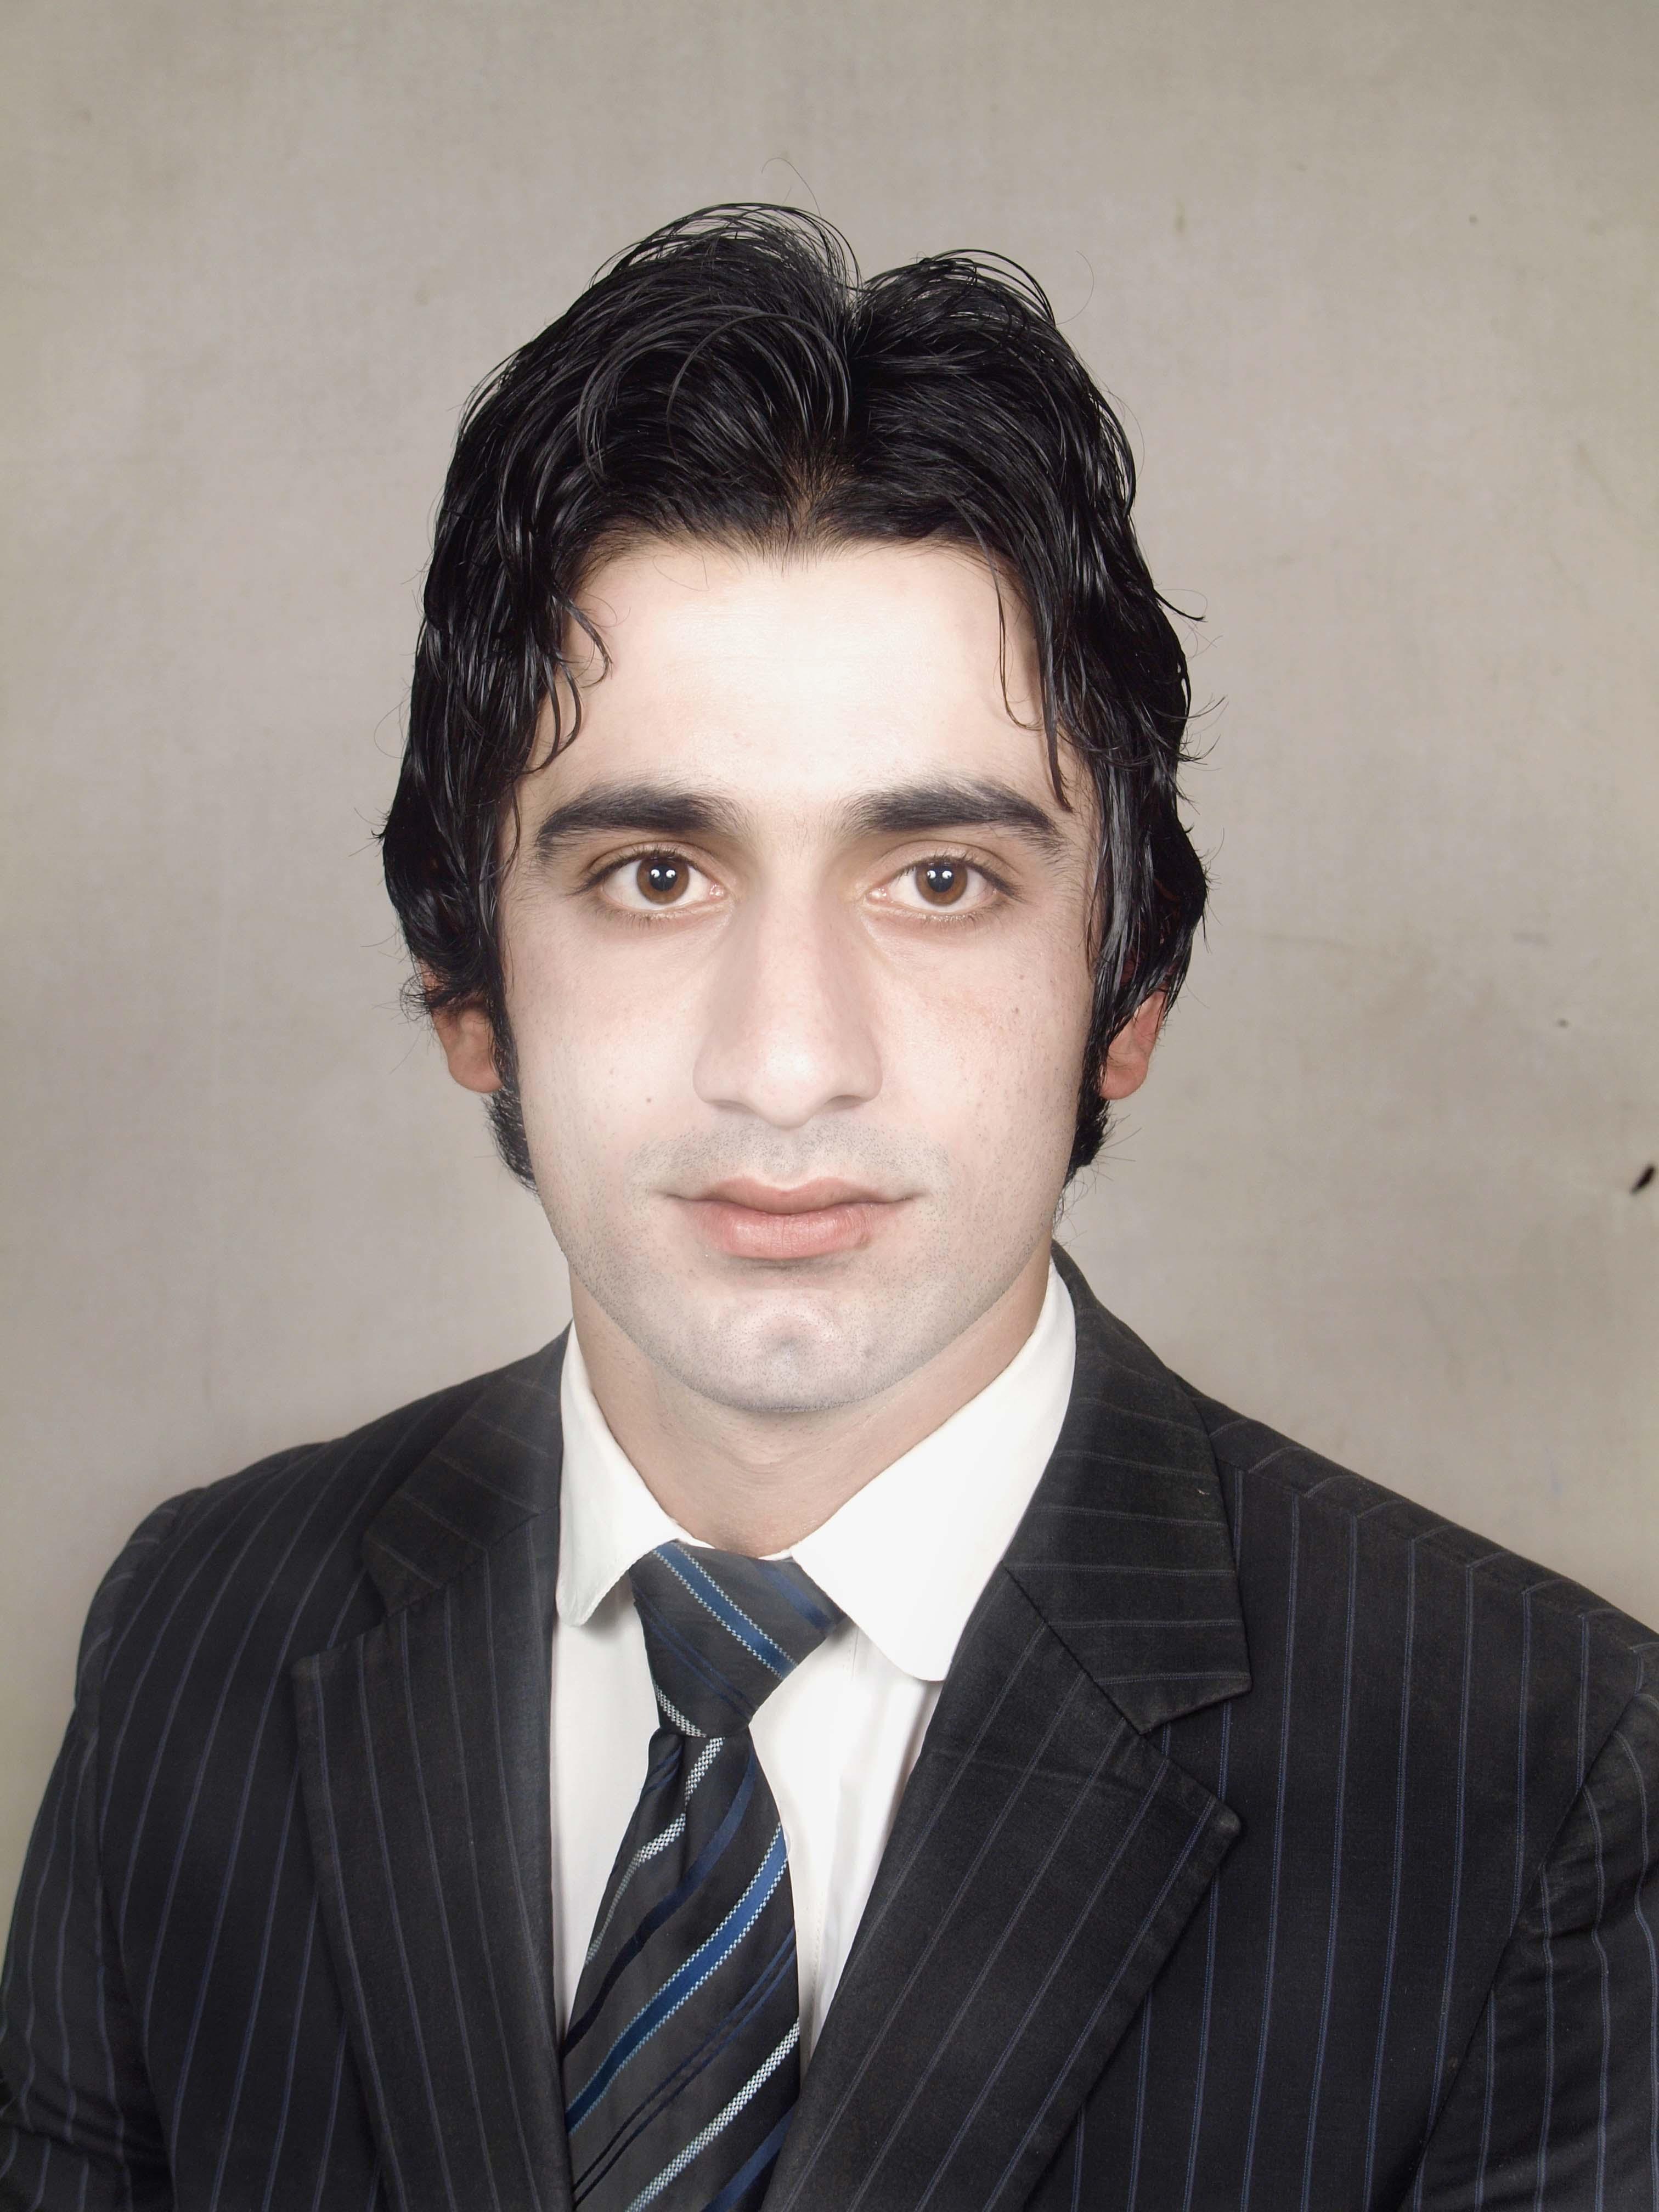 Mohammad Hayat